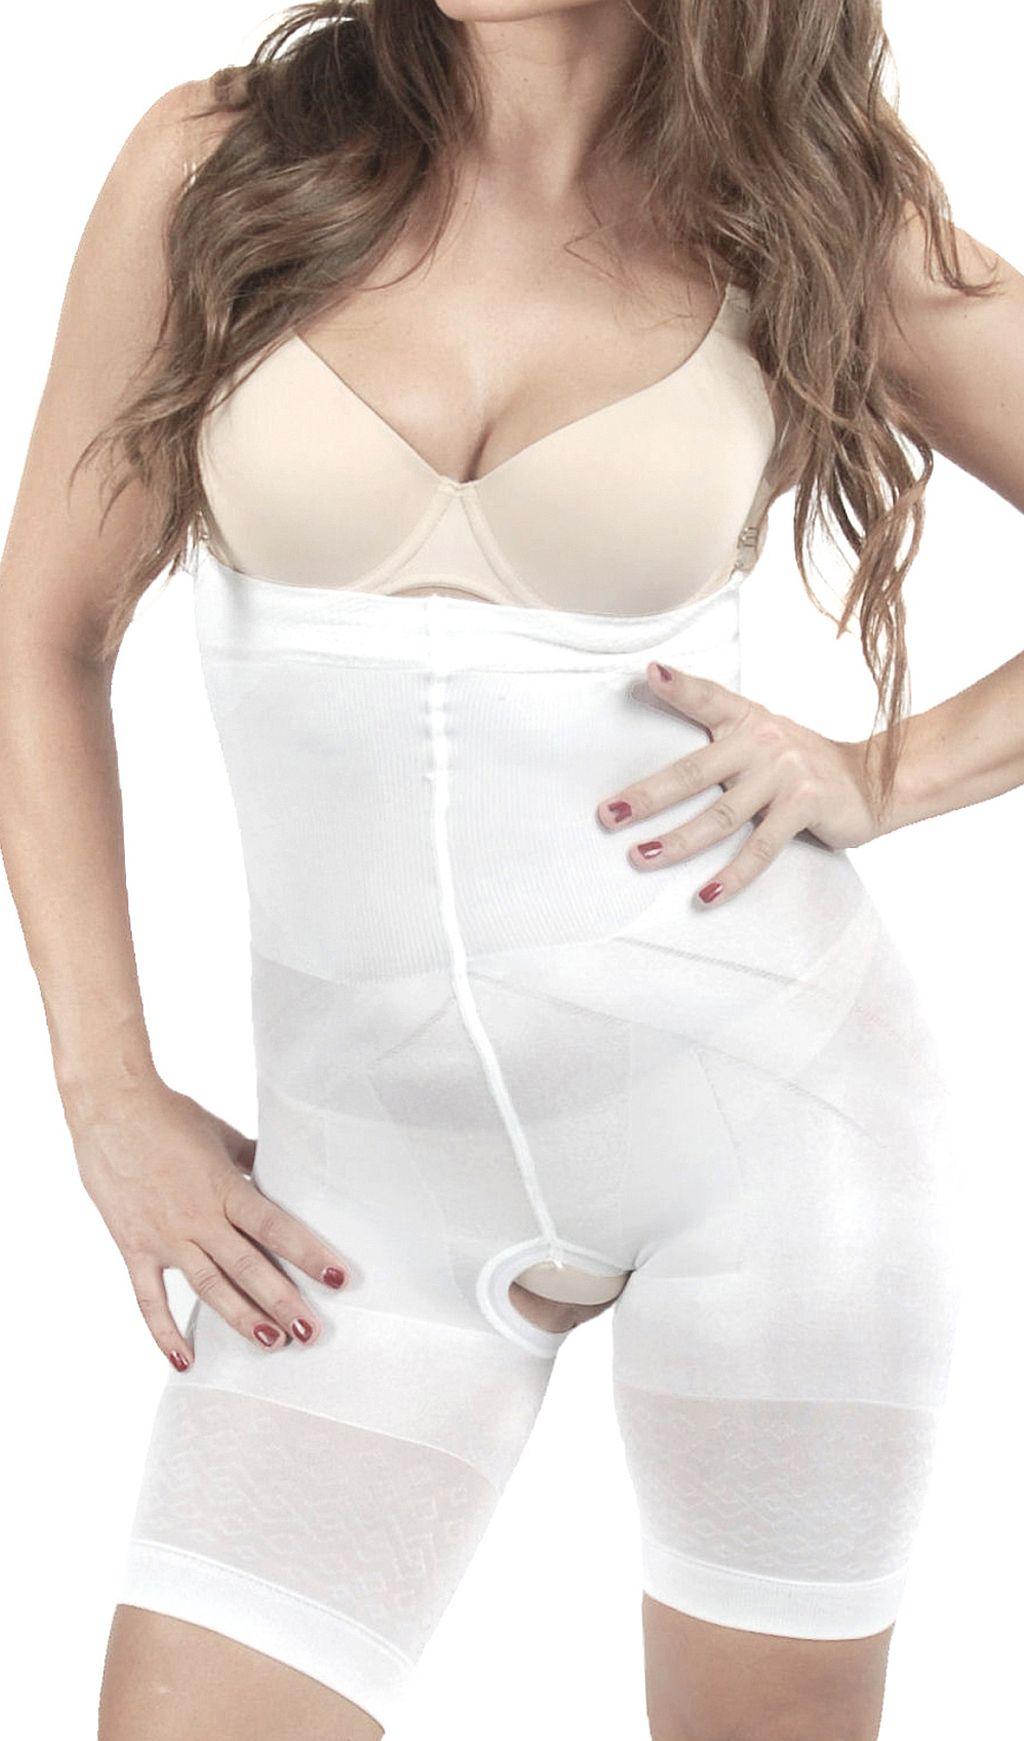 OriRose Damen Miederhose Panty Slim Comfort offener Schritt Weiß S-XXXL